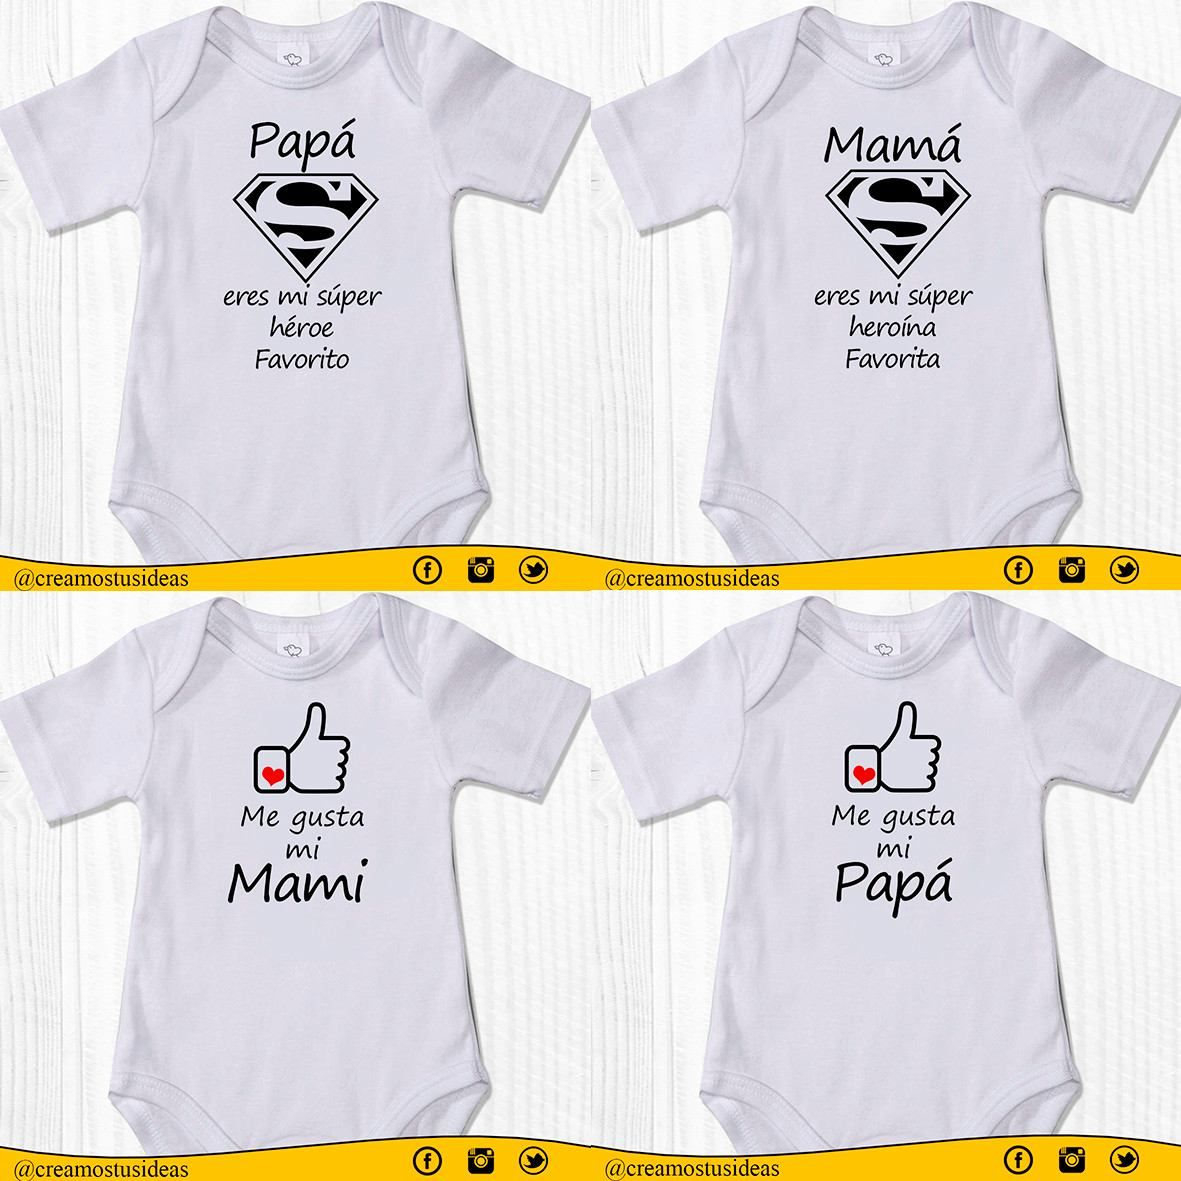 f7ec29e2e9e Bodys Personalizados Para Bebés De 0 A 24 Meses - Bs. 13.500